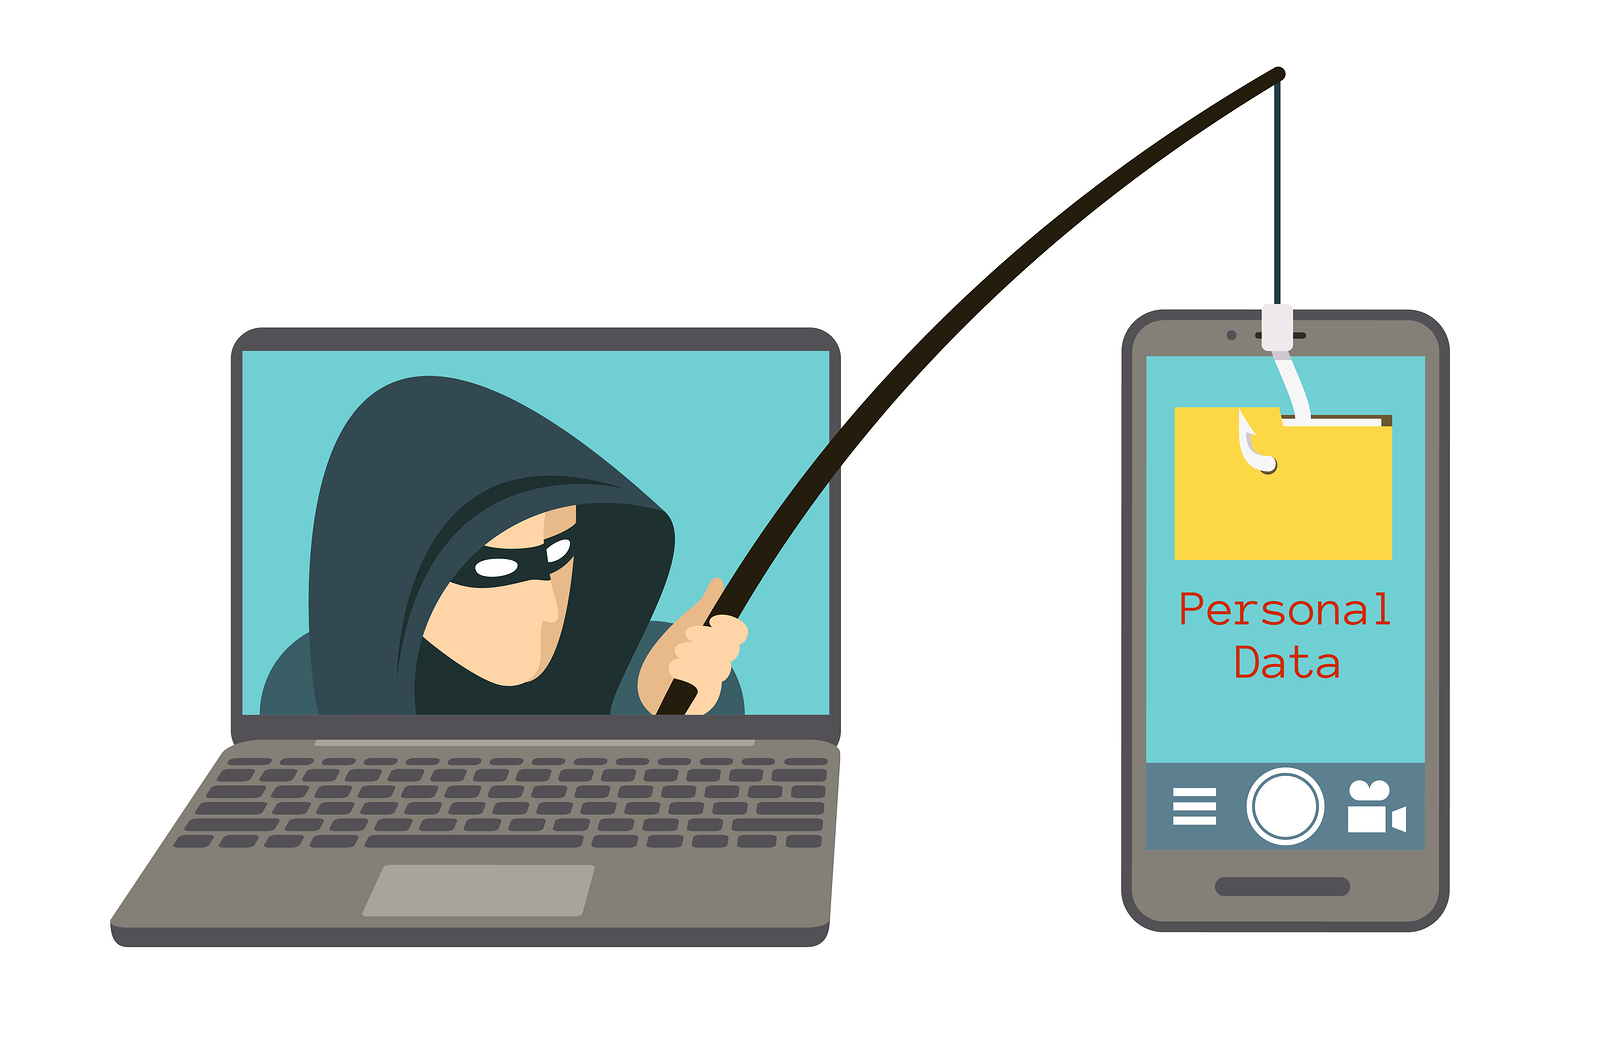 Software anti phishing per una protezione affidabile dal phishing